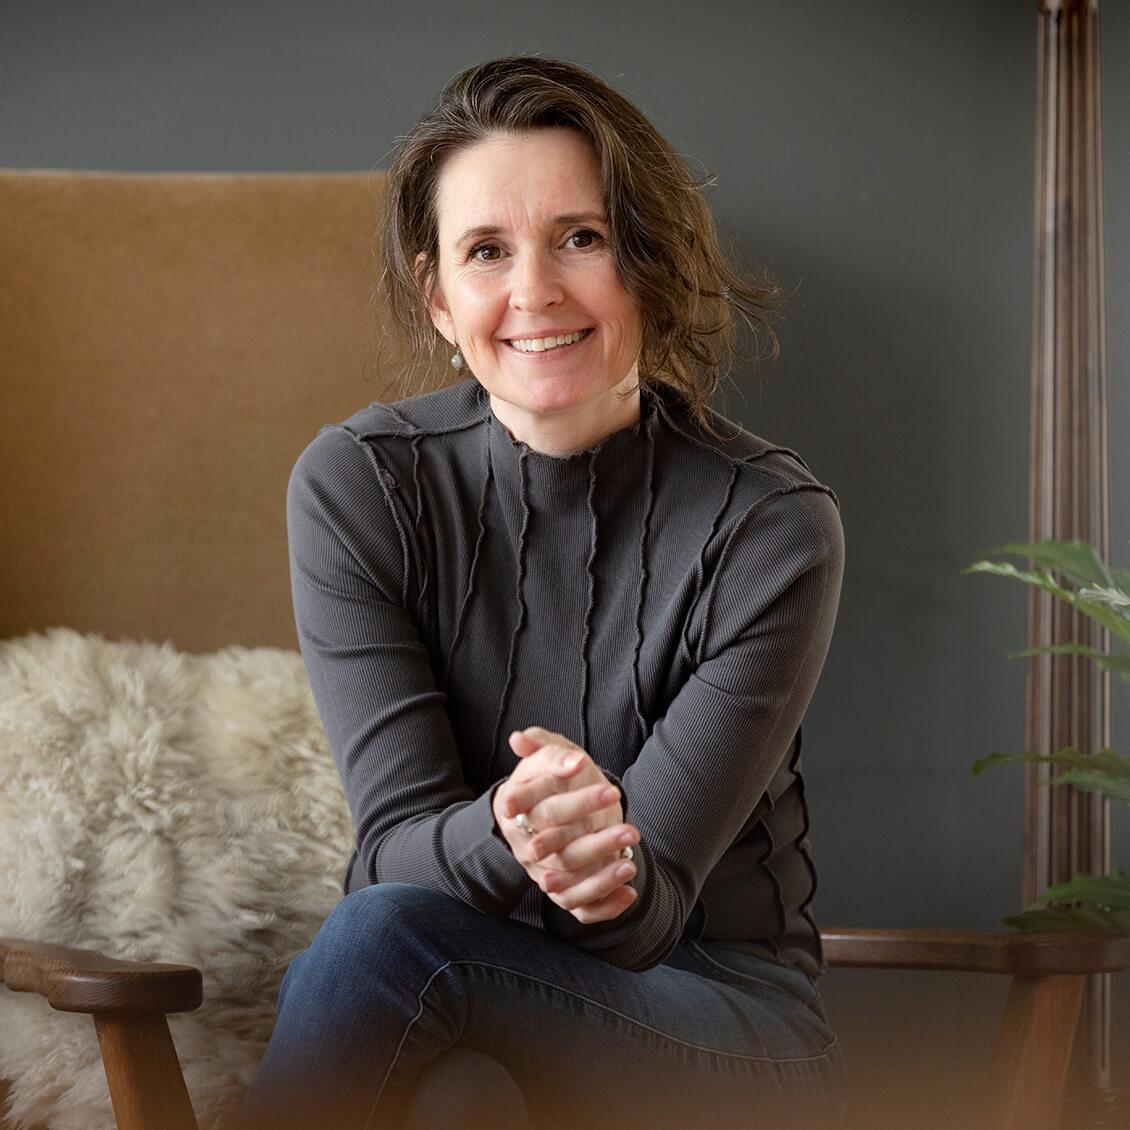 Forfatter og foredragsholder Sine Lyons - CH